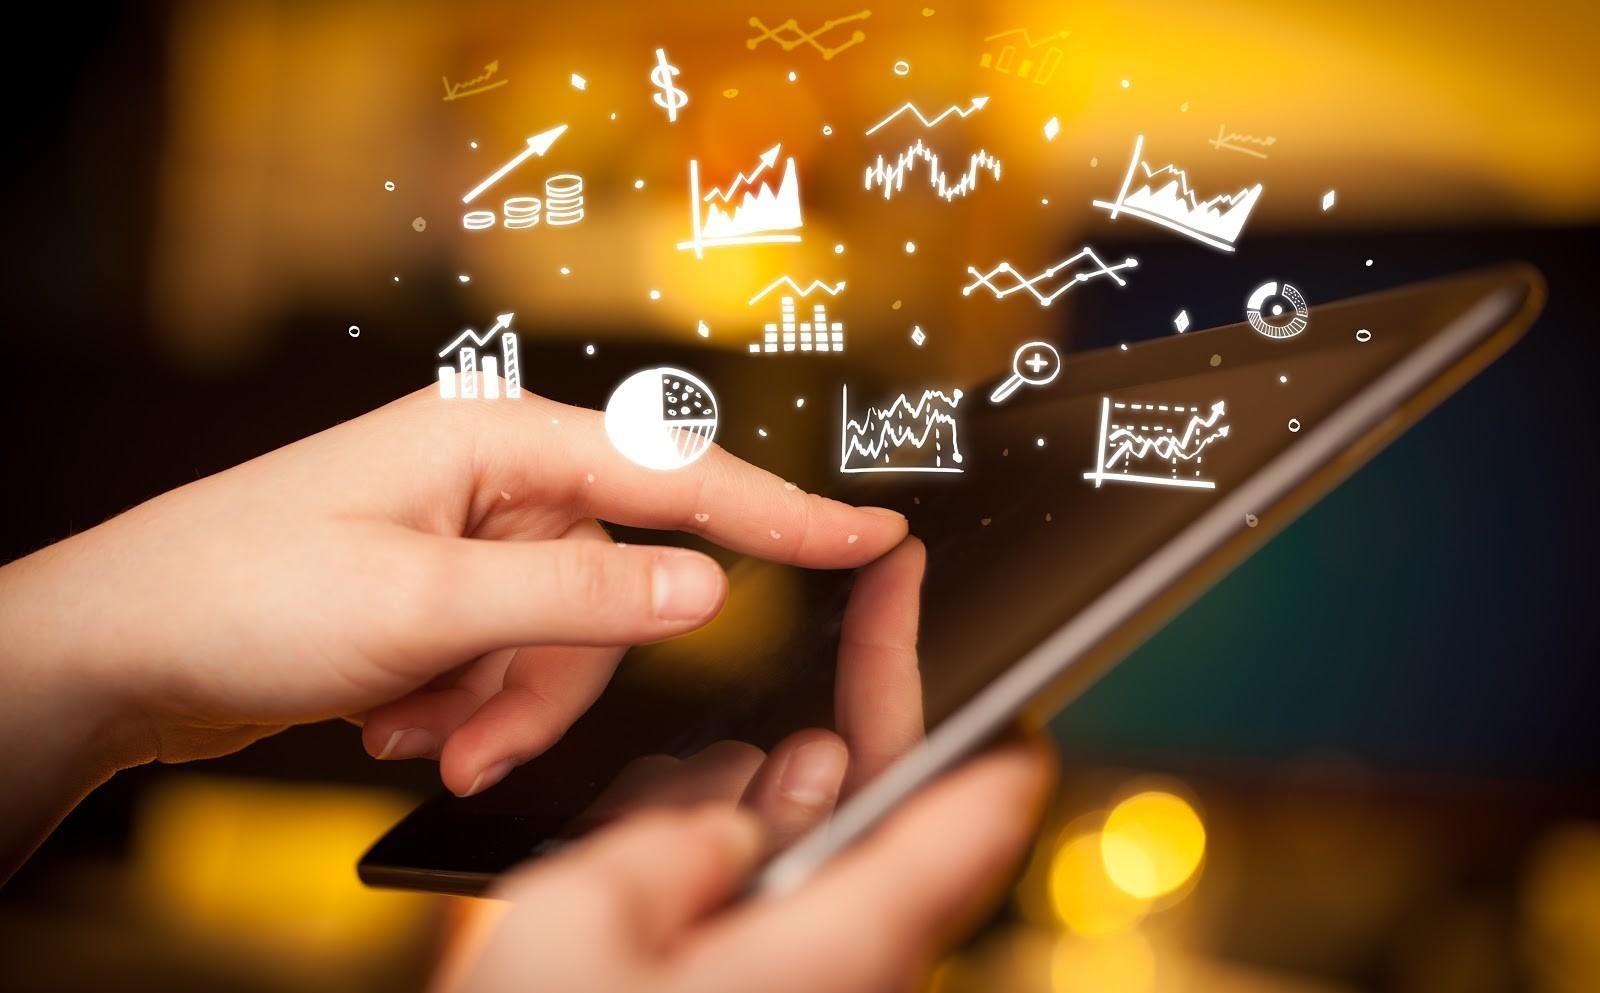 Digital Marketing คืออะไร สำคัญกับธุรกิจยุคปัจจุบันอย่างไร